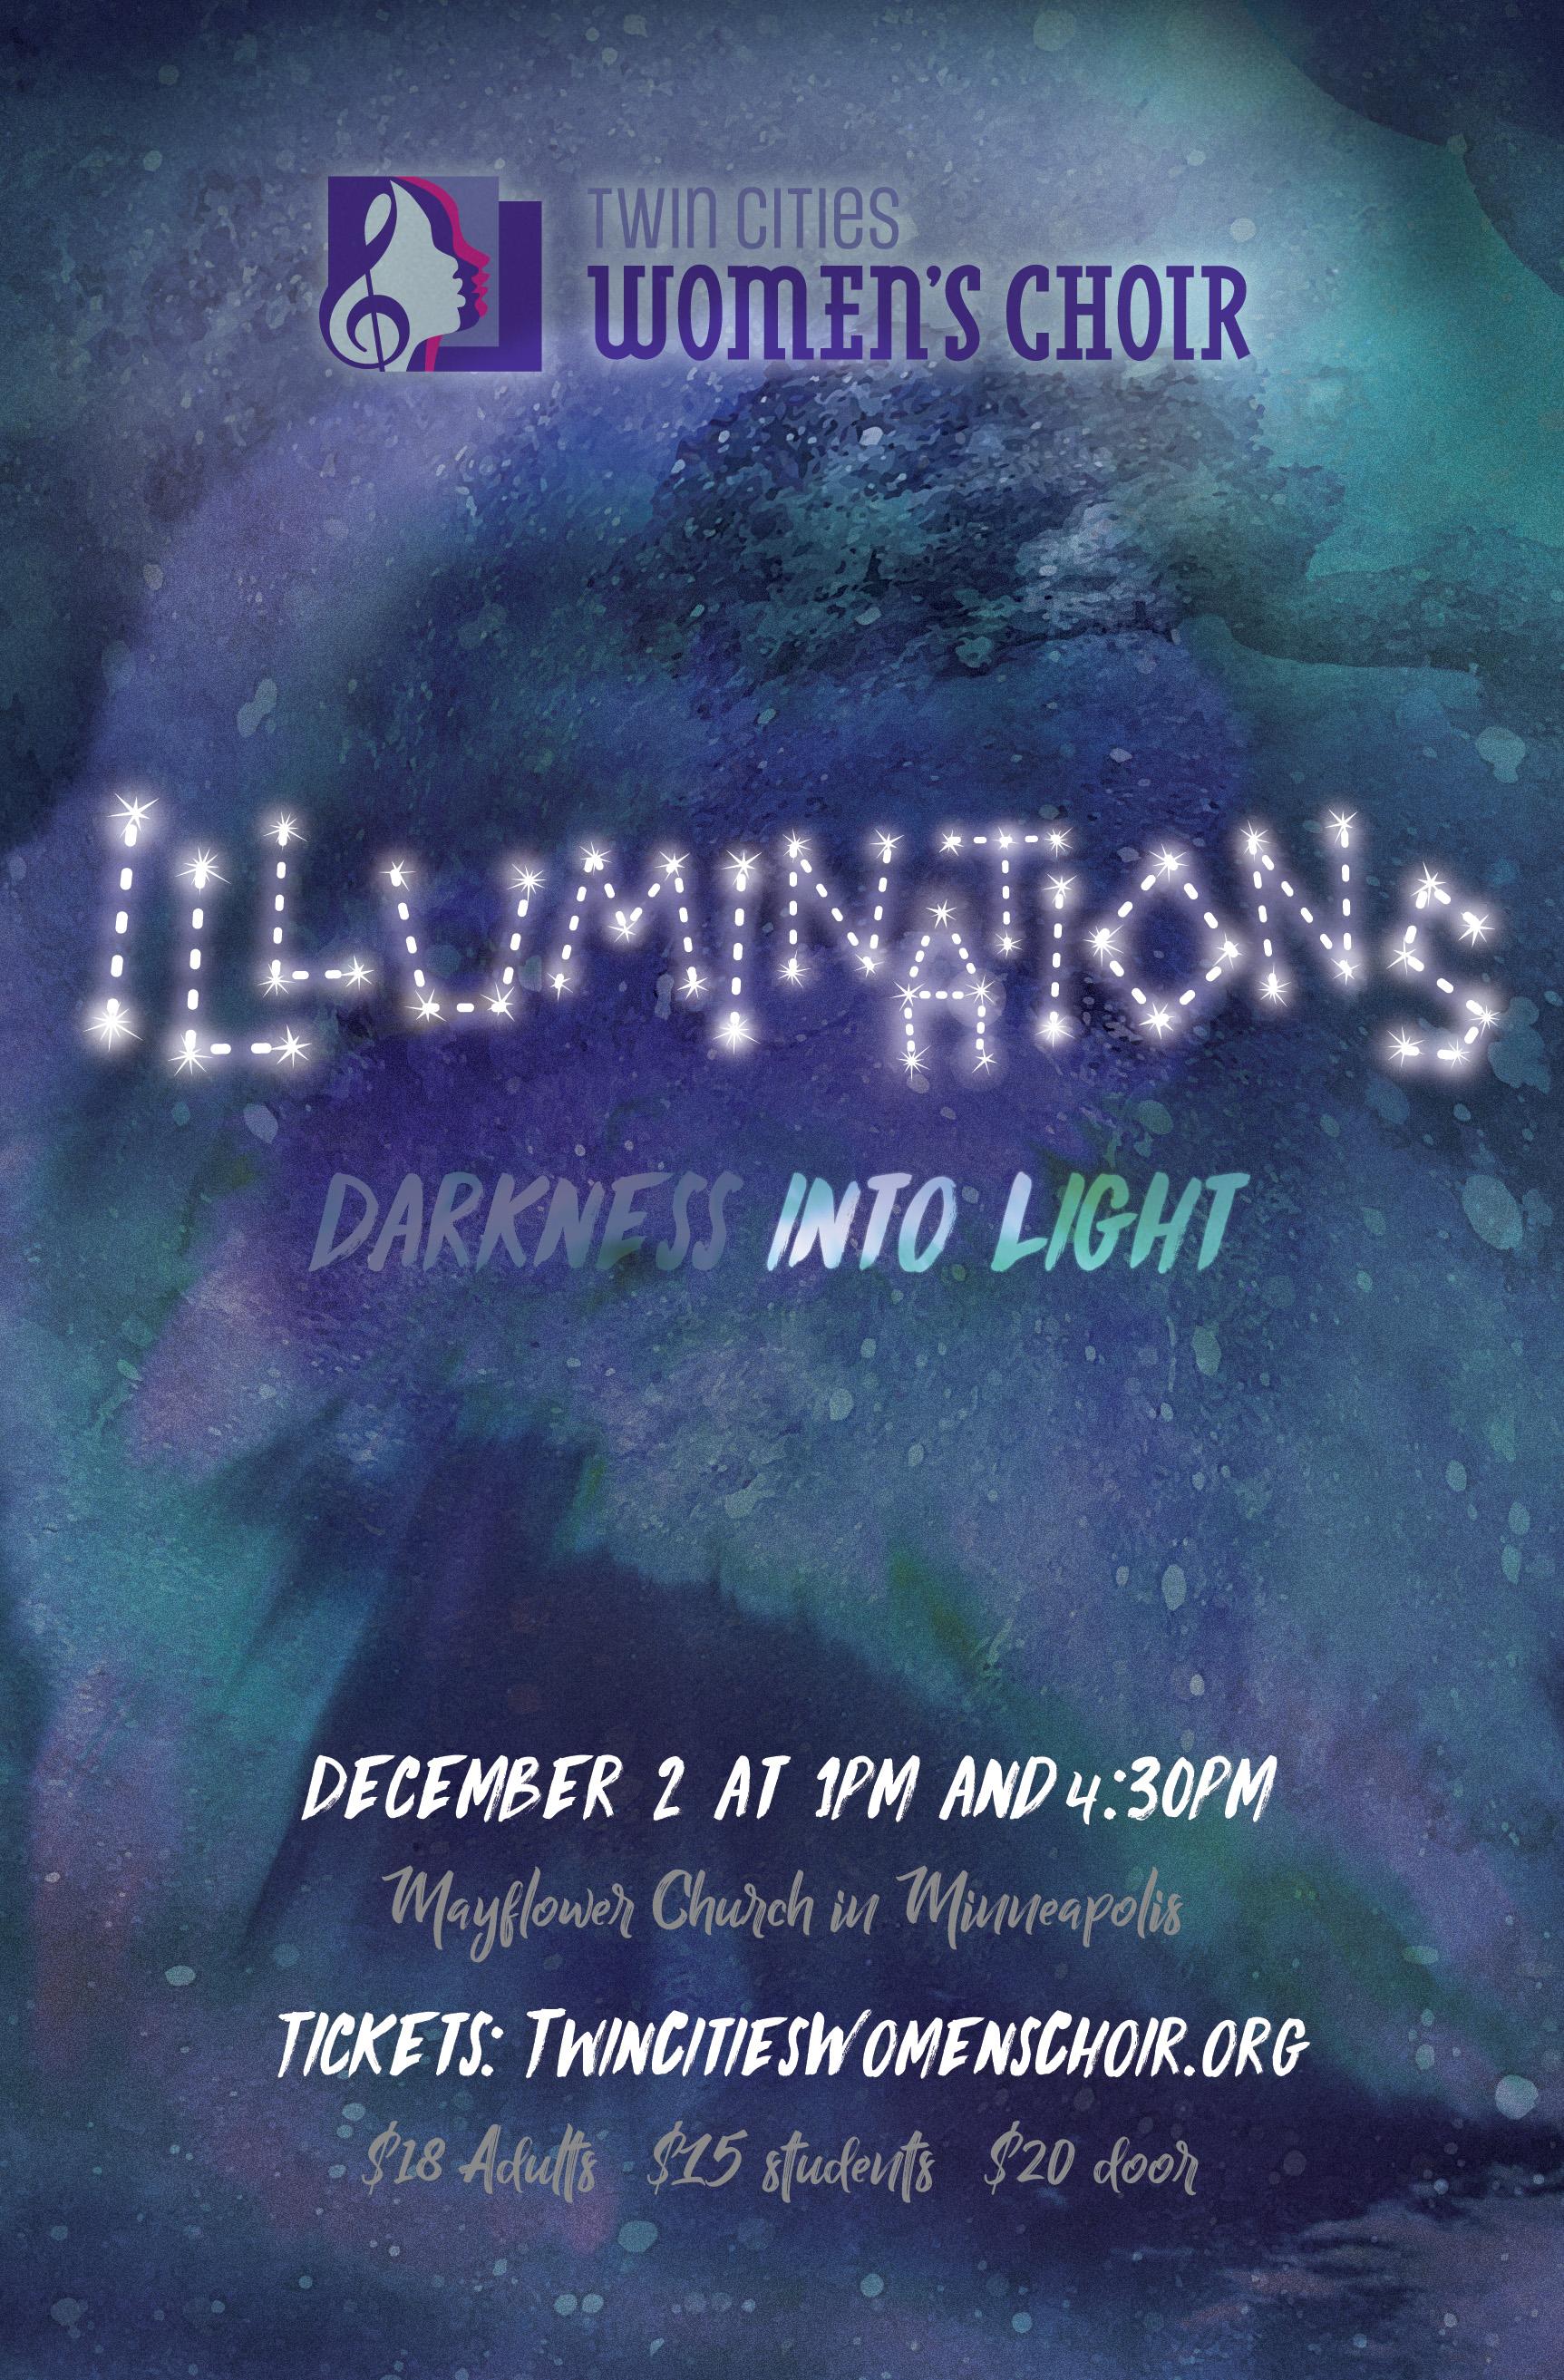 IlluminationsFullCover_RGB_(1).jpg